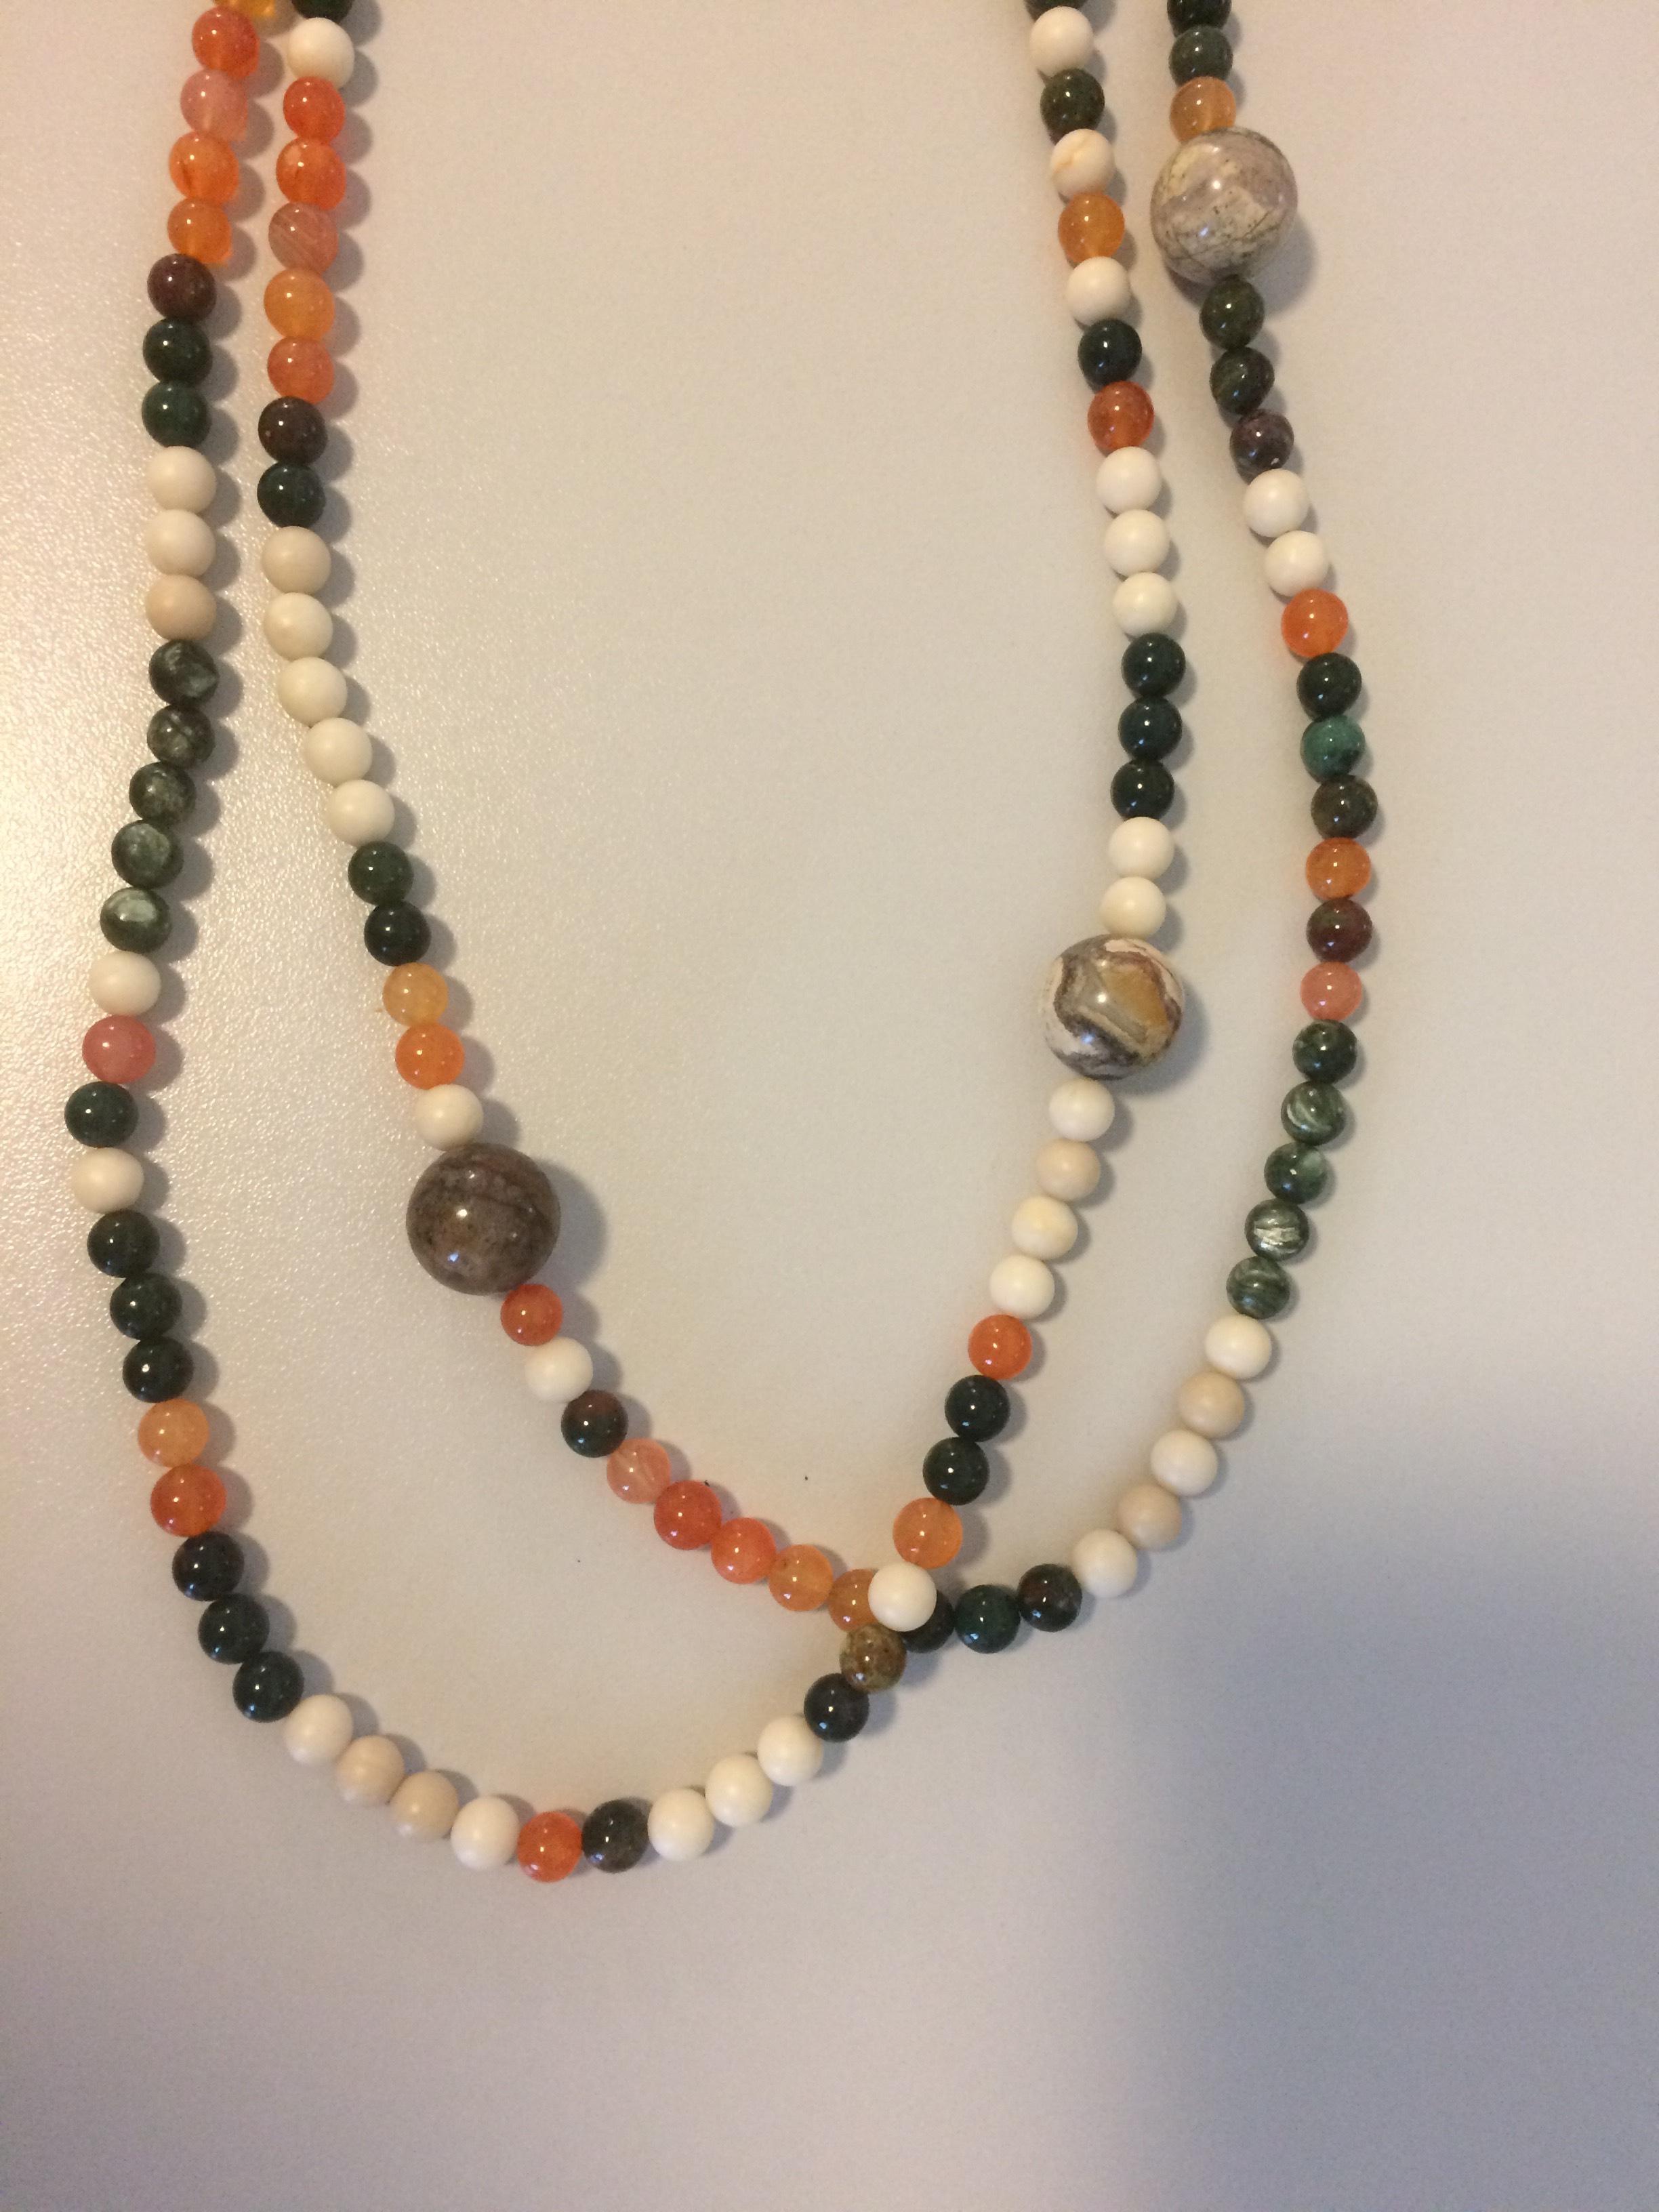 Bloodstone, Seraphinite, Carnelian, Matte Wood Agate, Morganite, Petersite, Porcaline Jasper Gold-Filled Chain/Findings, Flex Wire Necklace